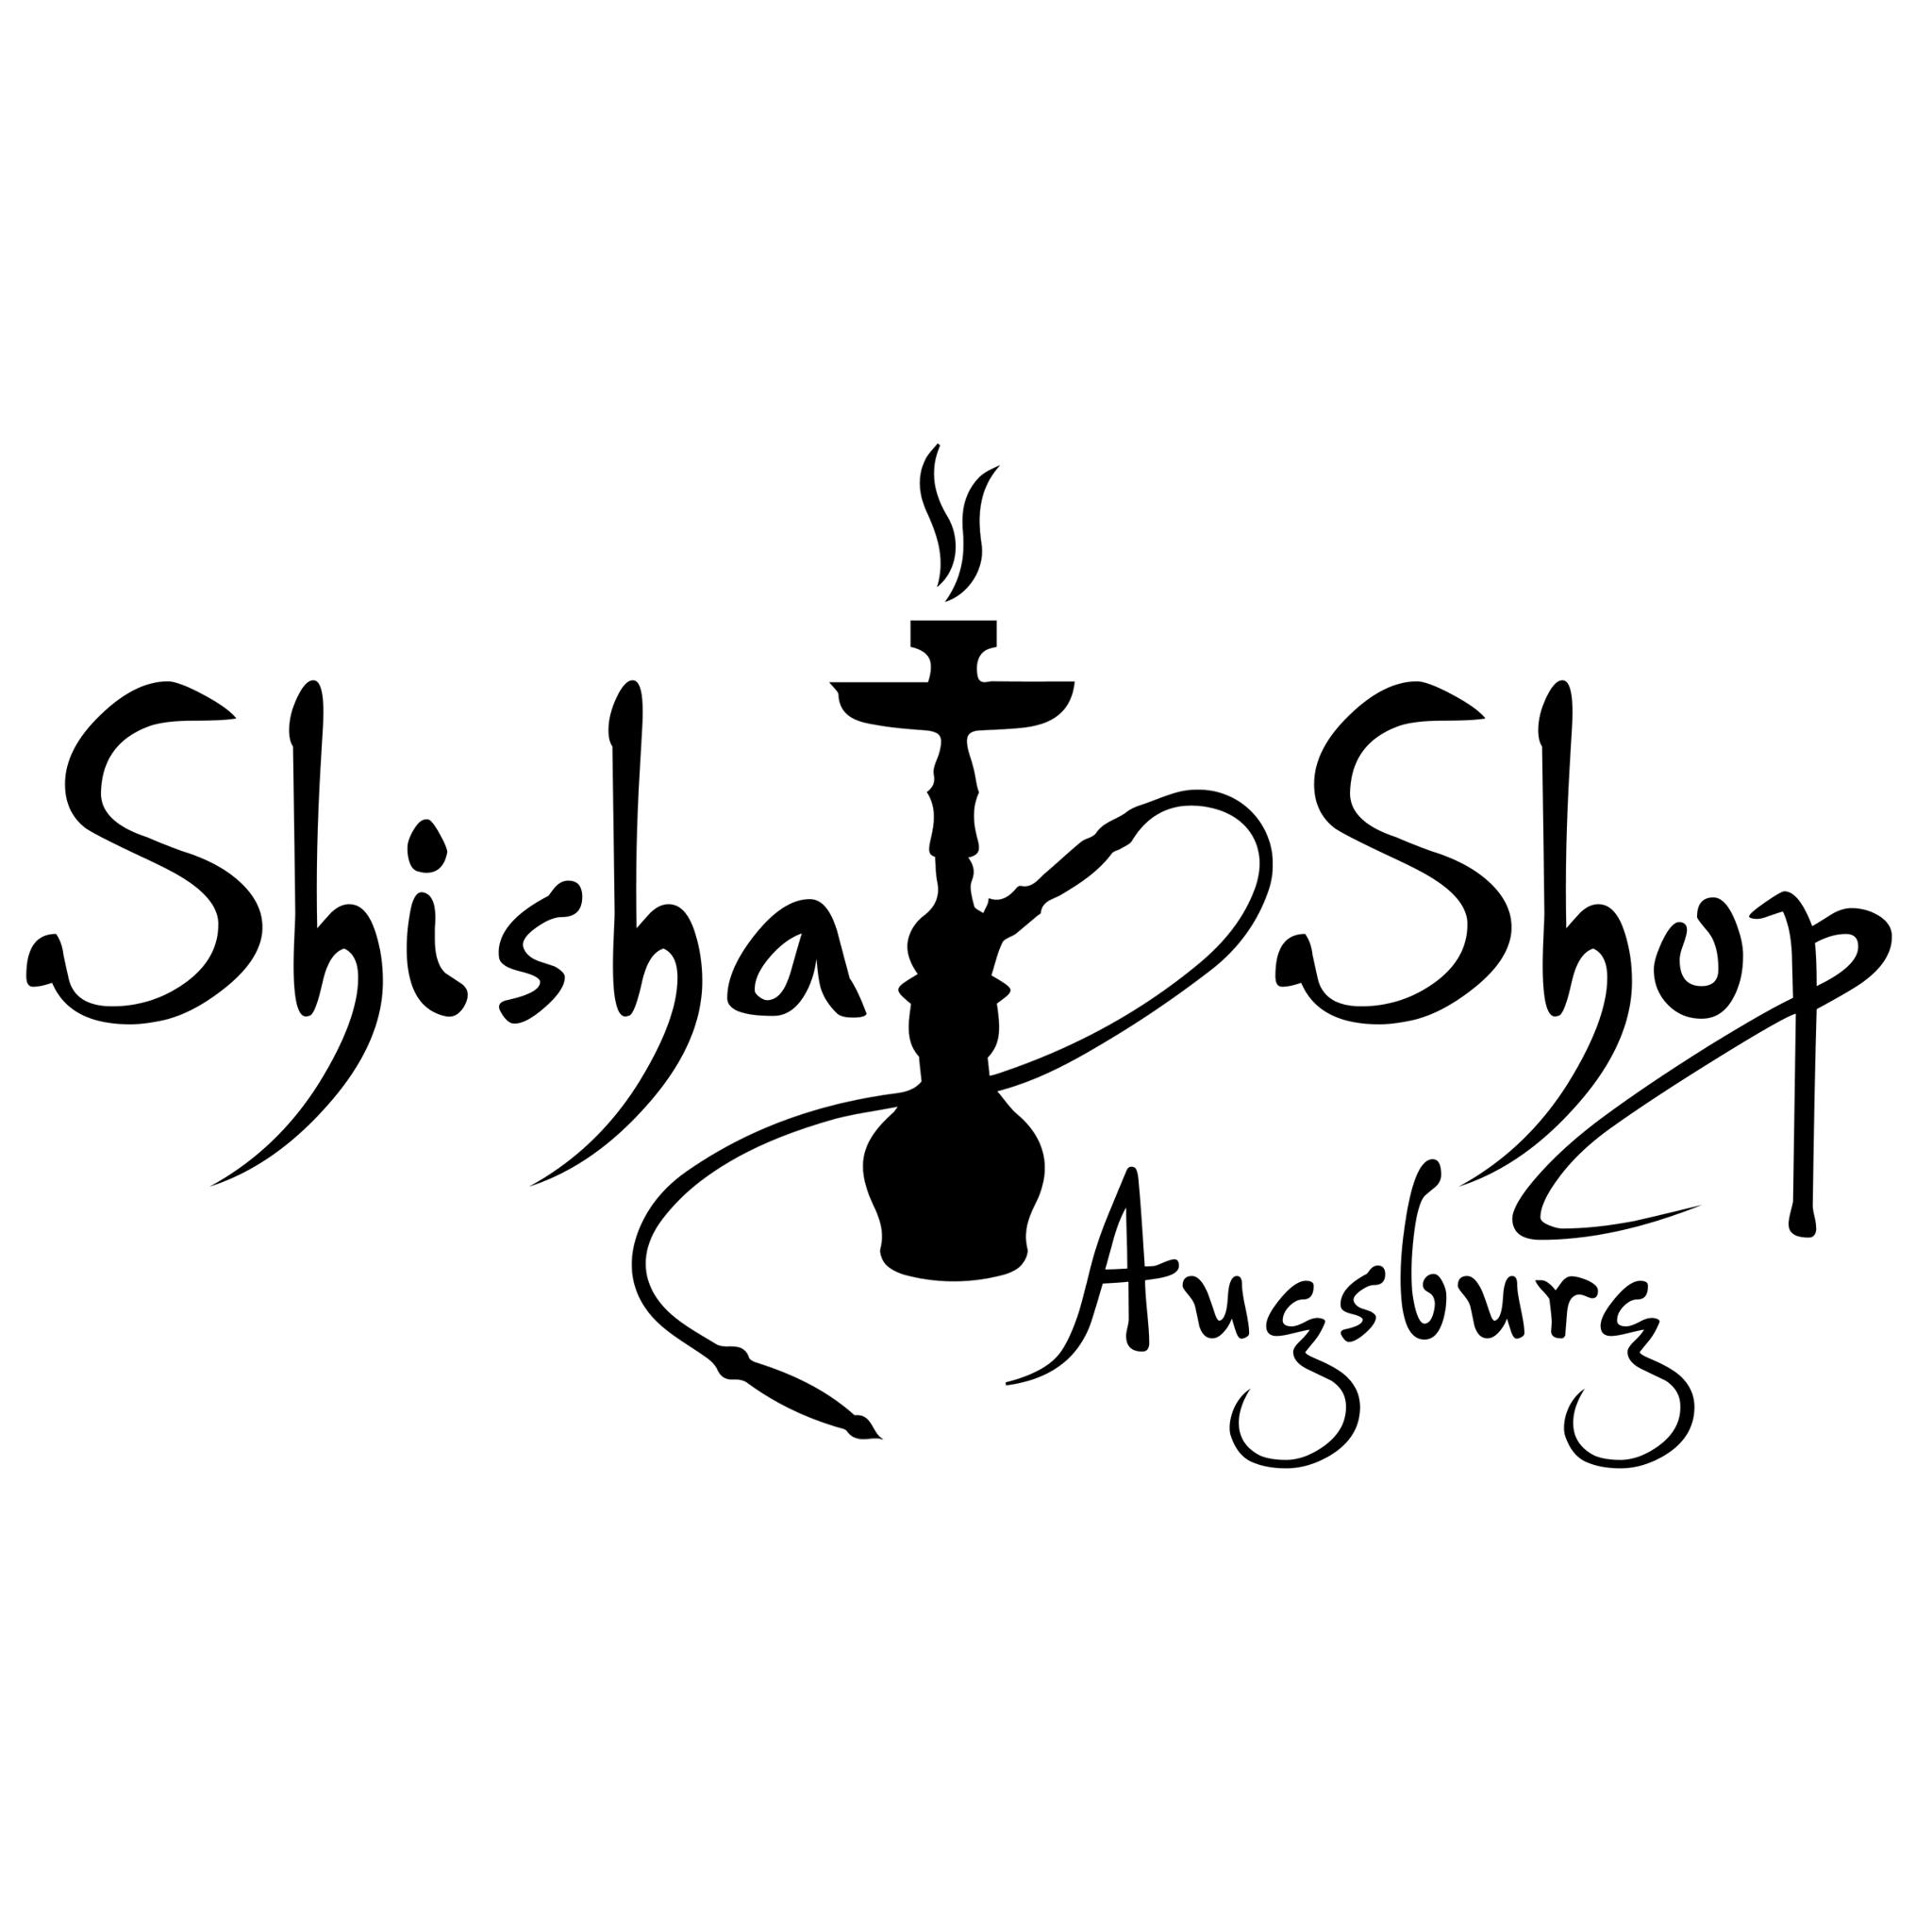 Shishashop Augsburg